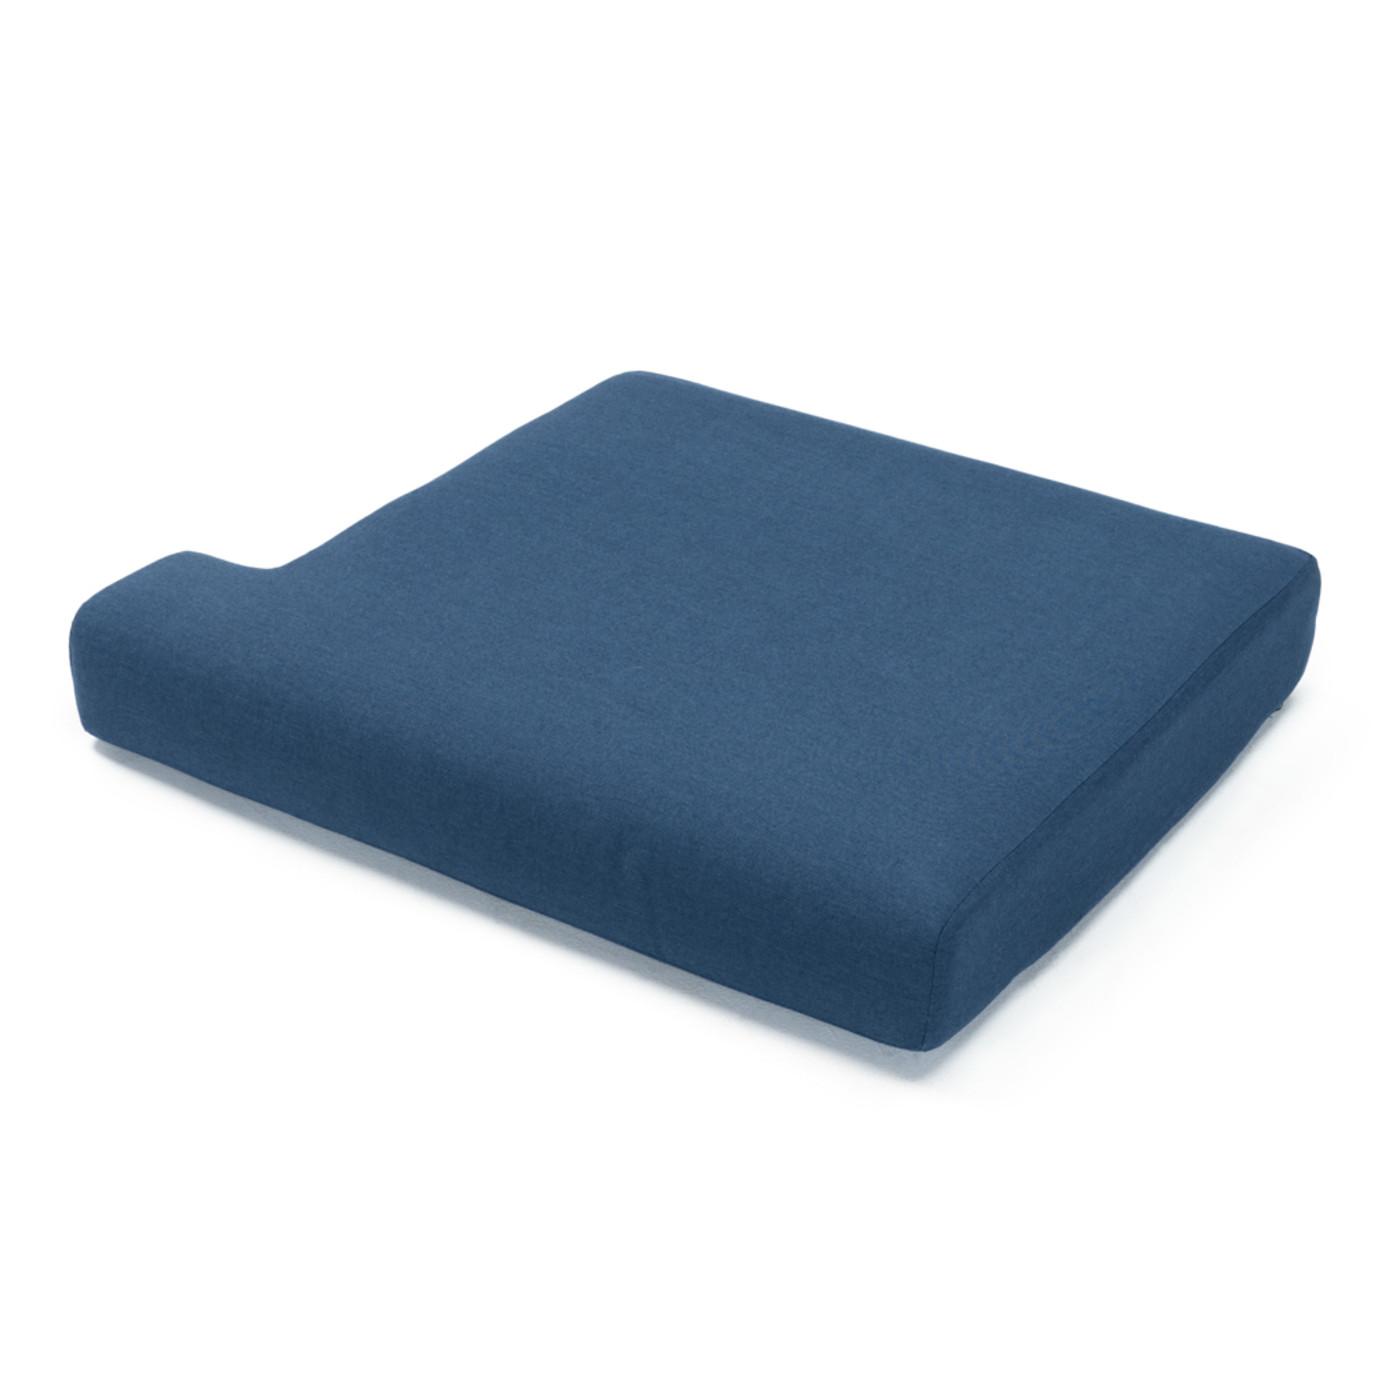 Portofino Comfort 71in Loveseat Right Base Cushion - Laguna Blue